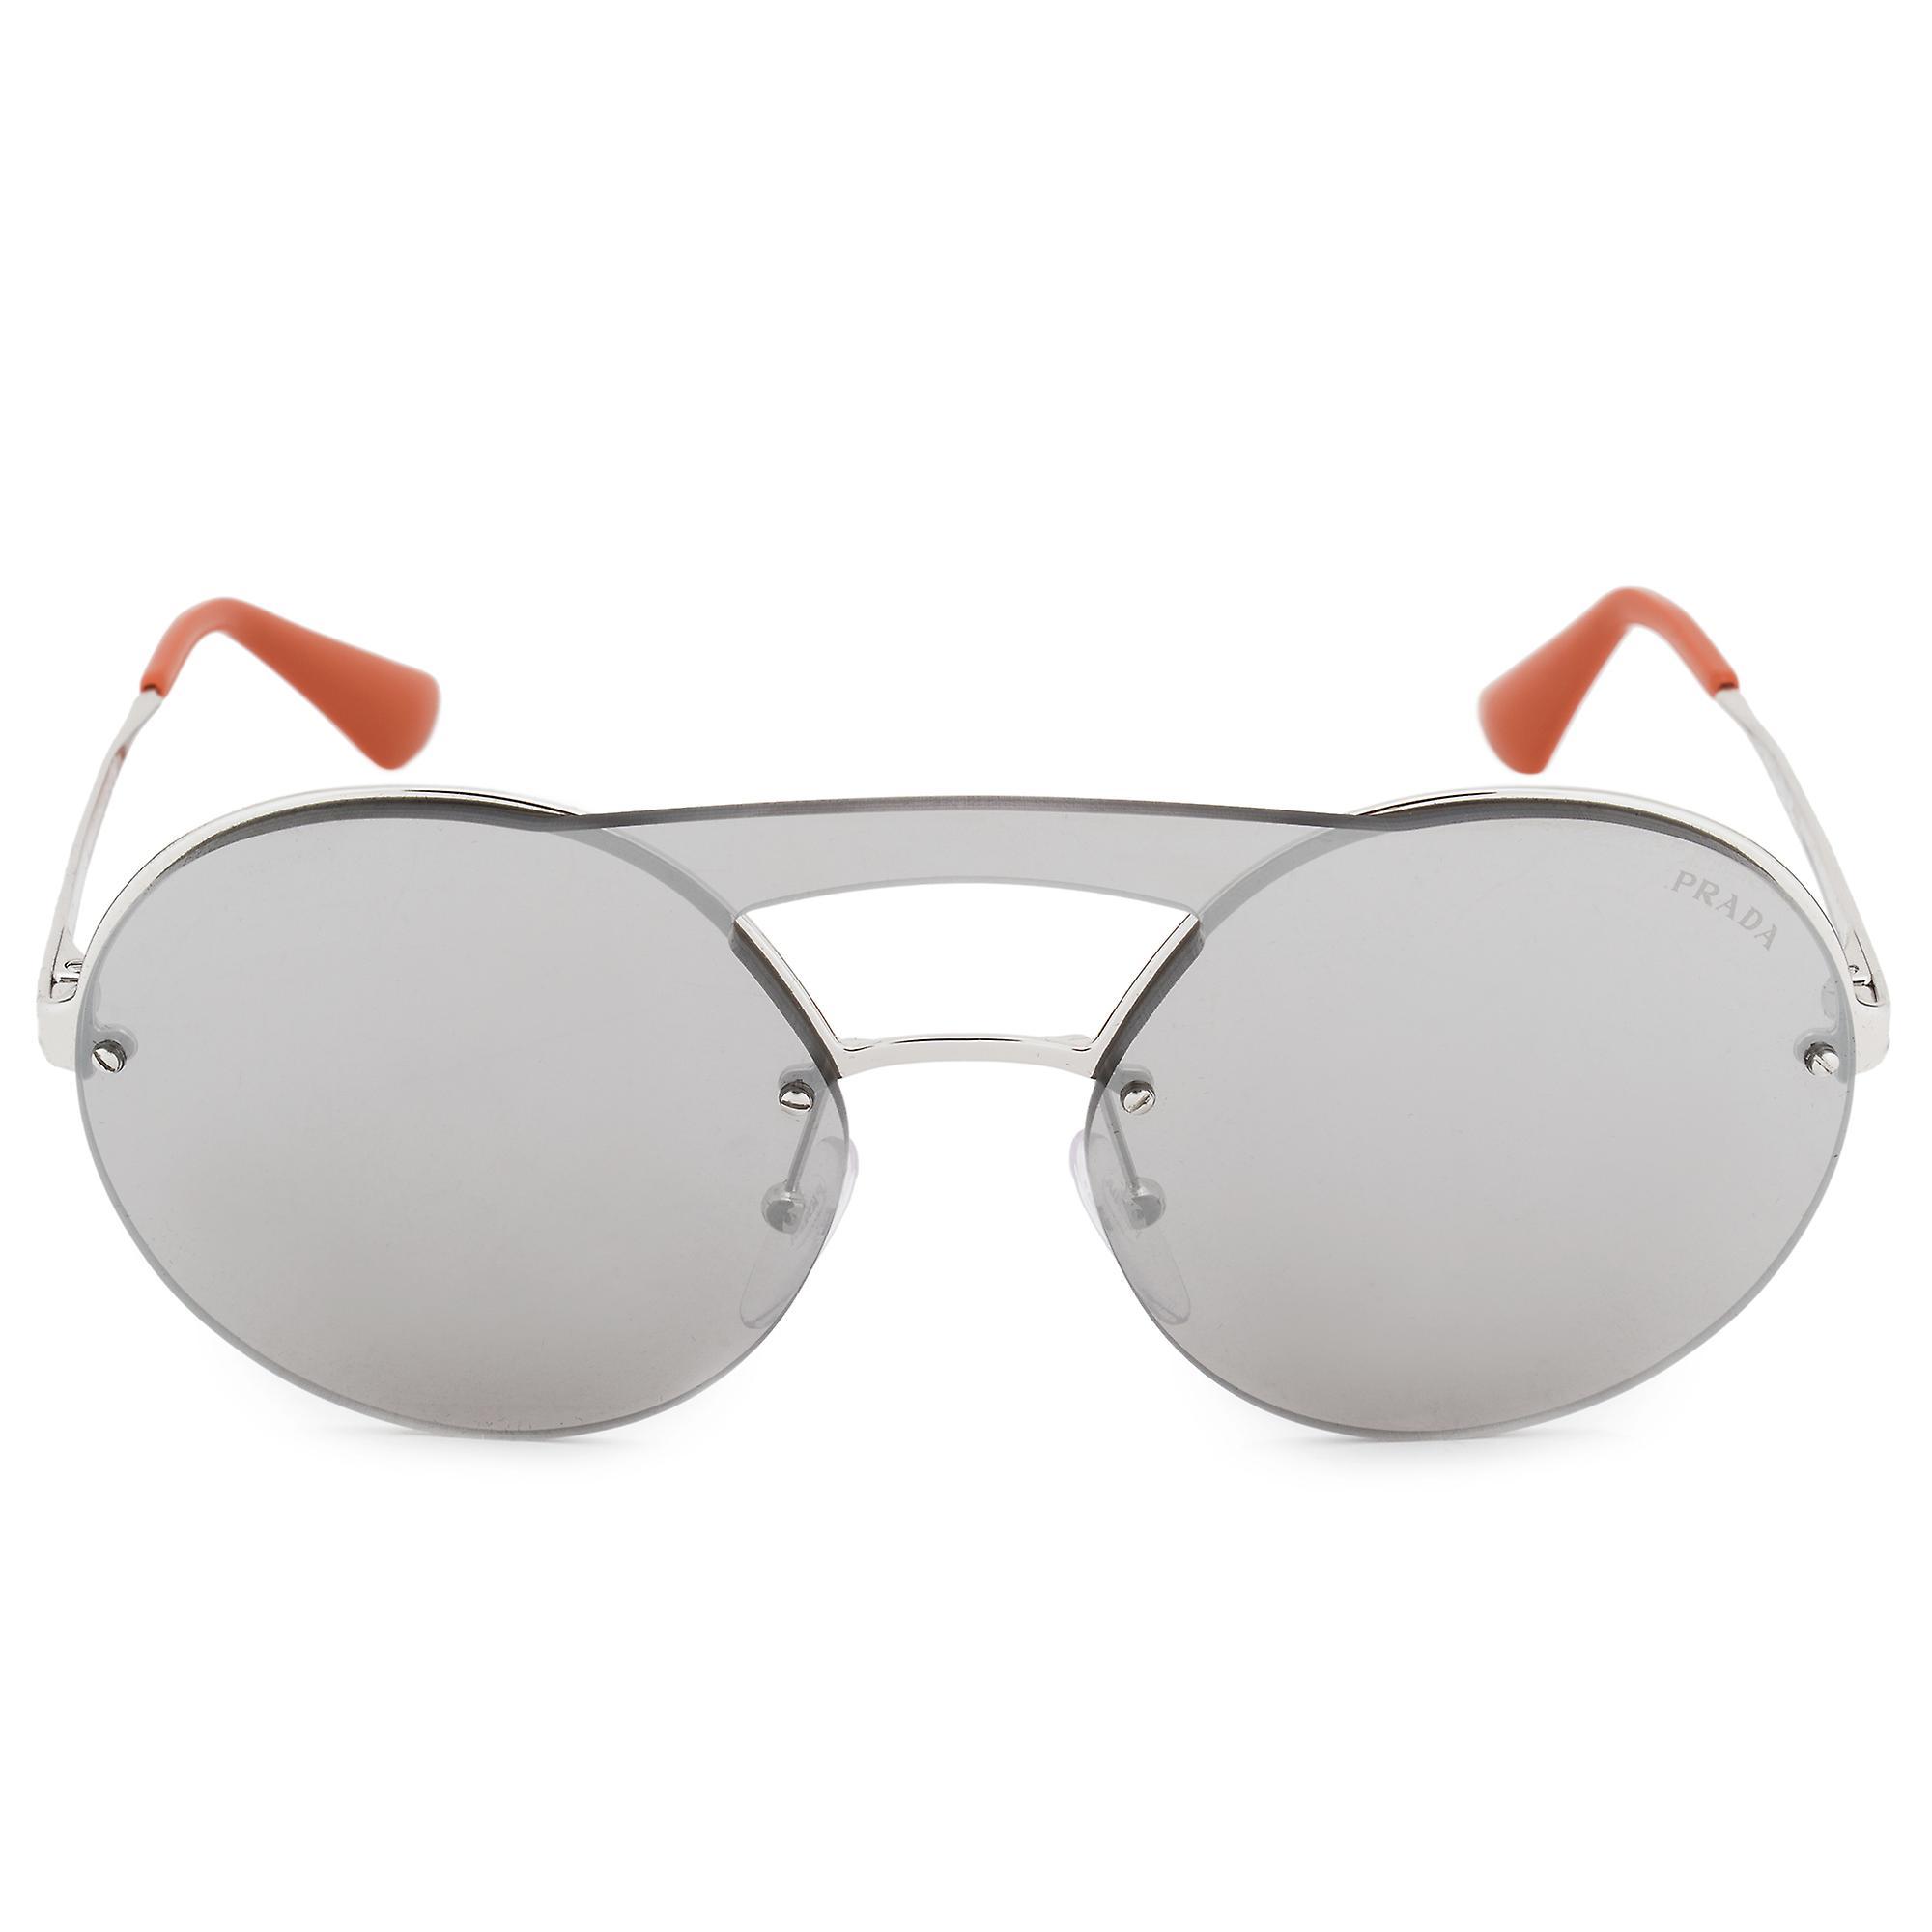 Prada Single Lens Round Sunglasses PR65TS 1BC2B0 36